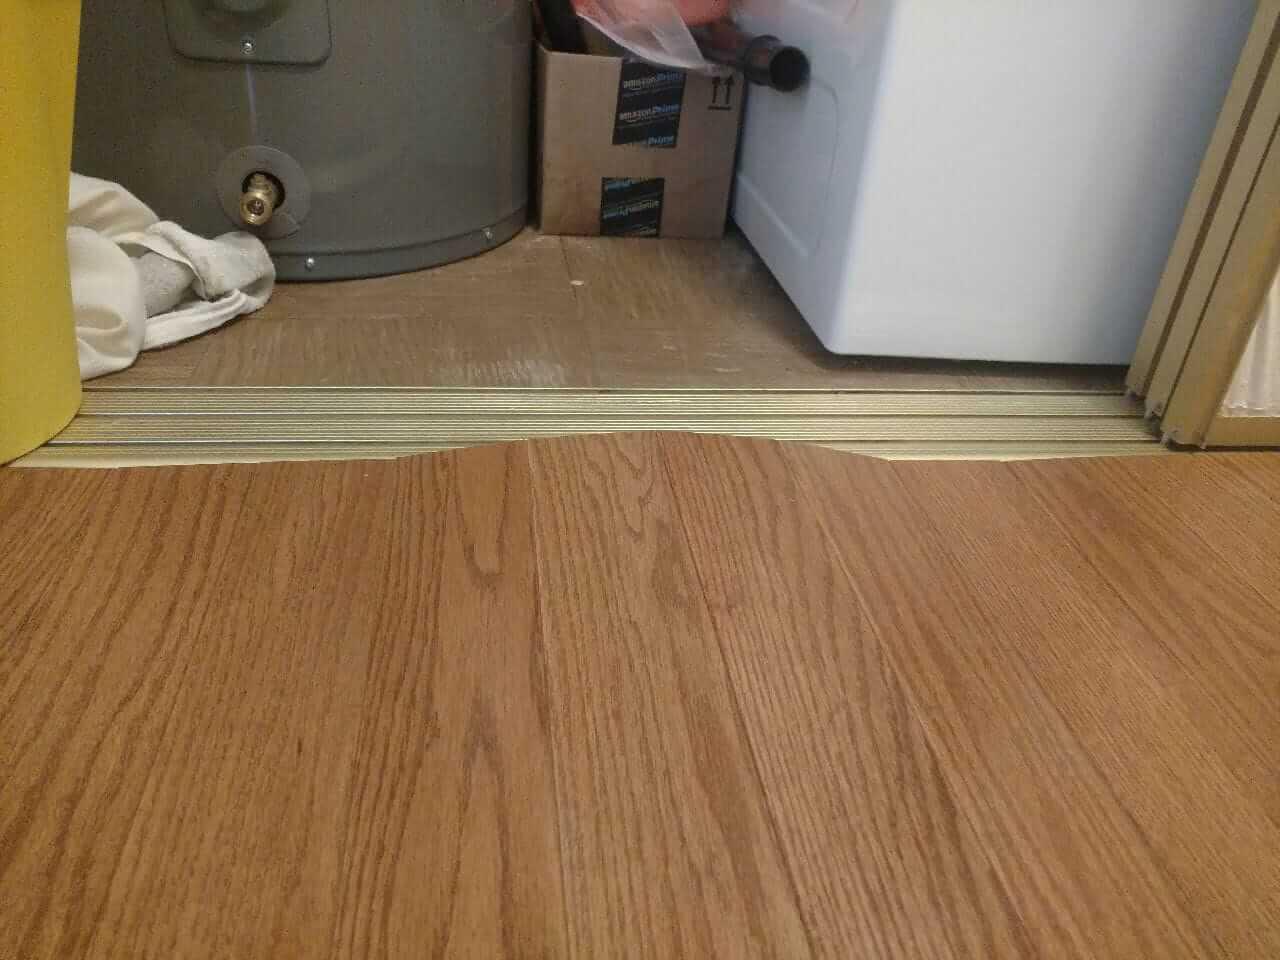 Floating vinyl floor piles up